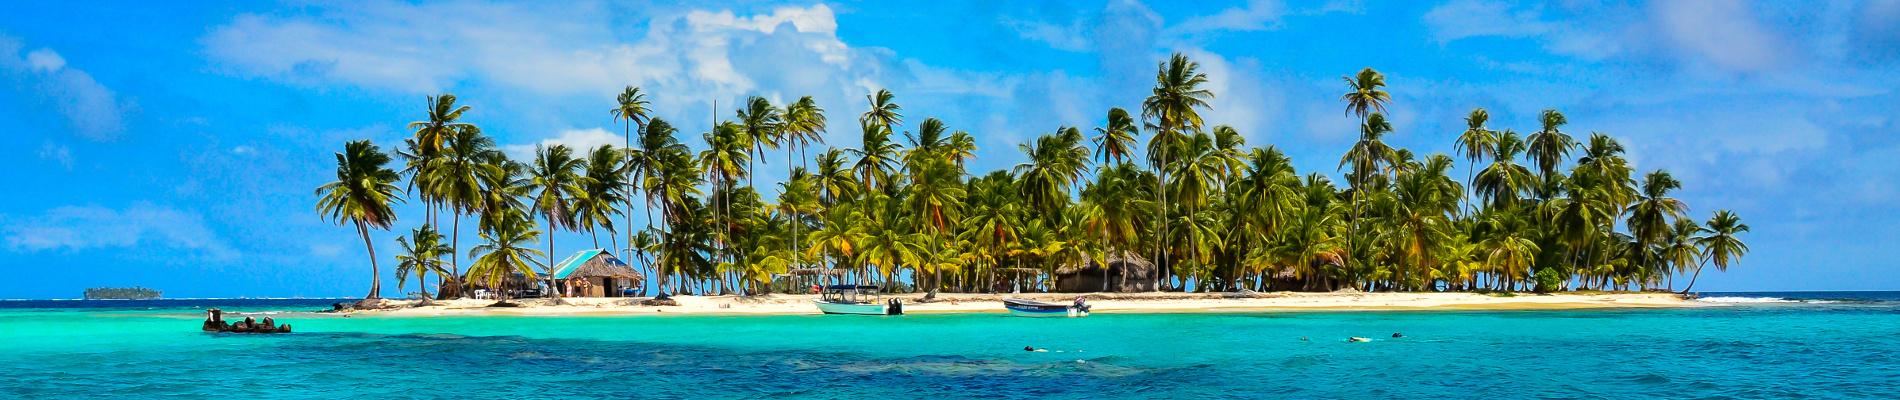 panama-island-st